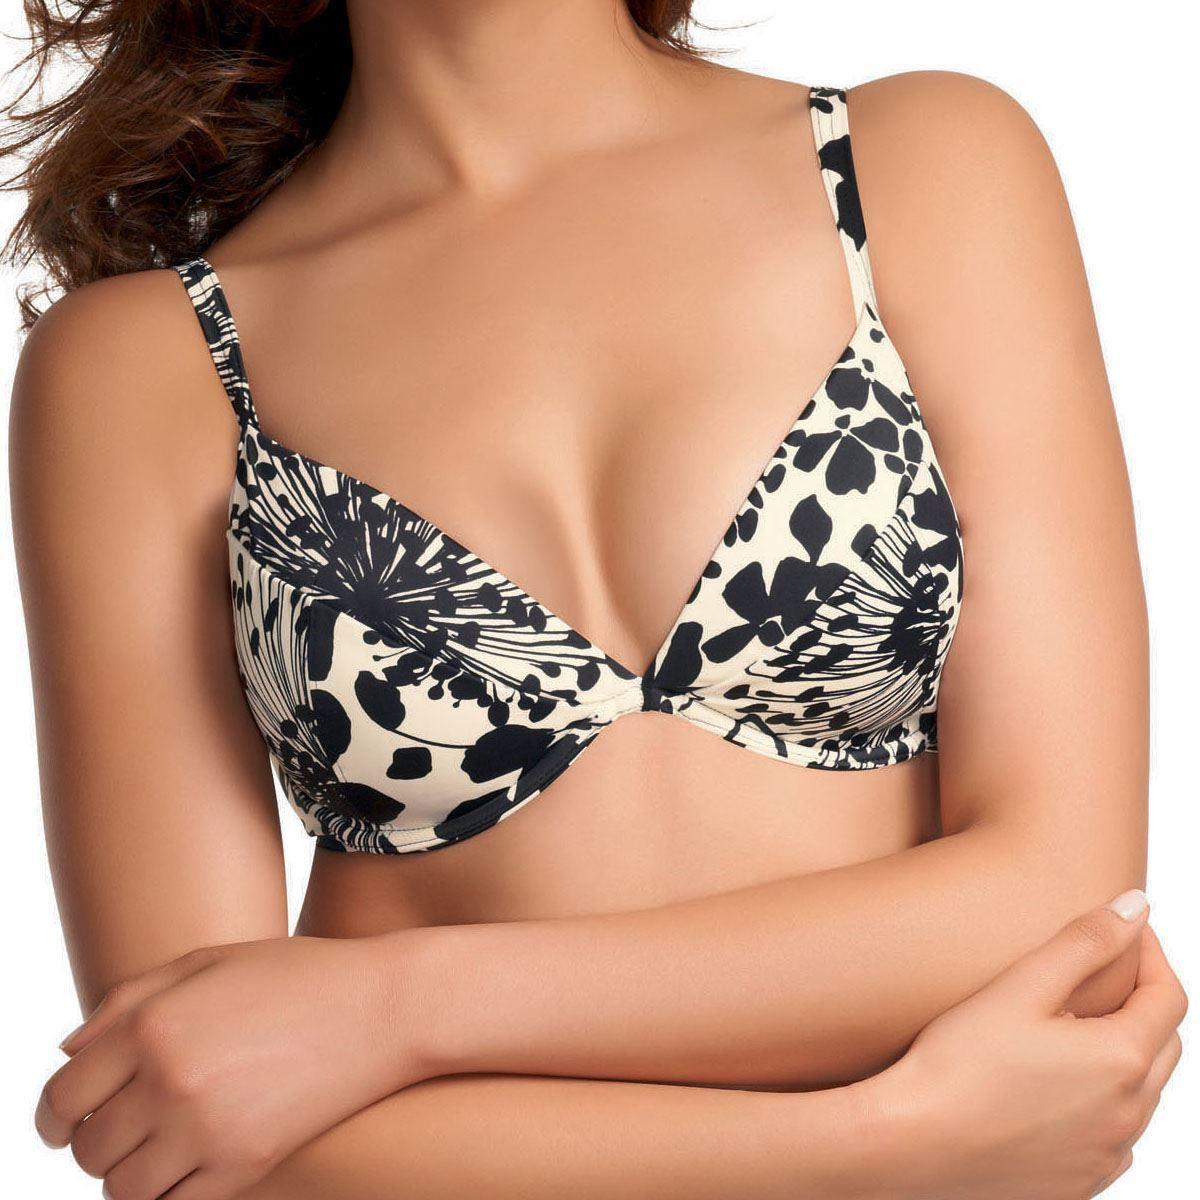 Women's Clothing new Bikini Top 32d